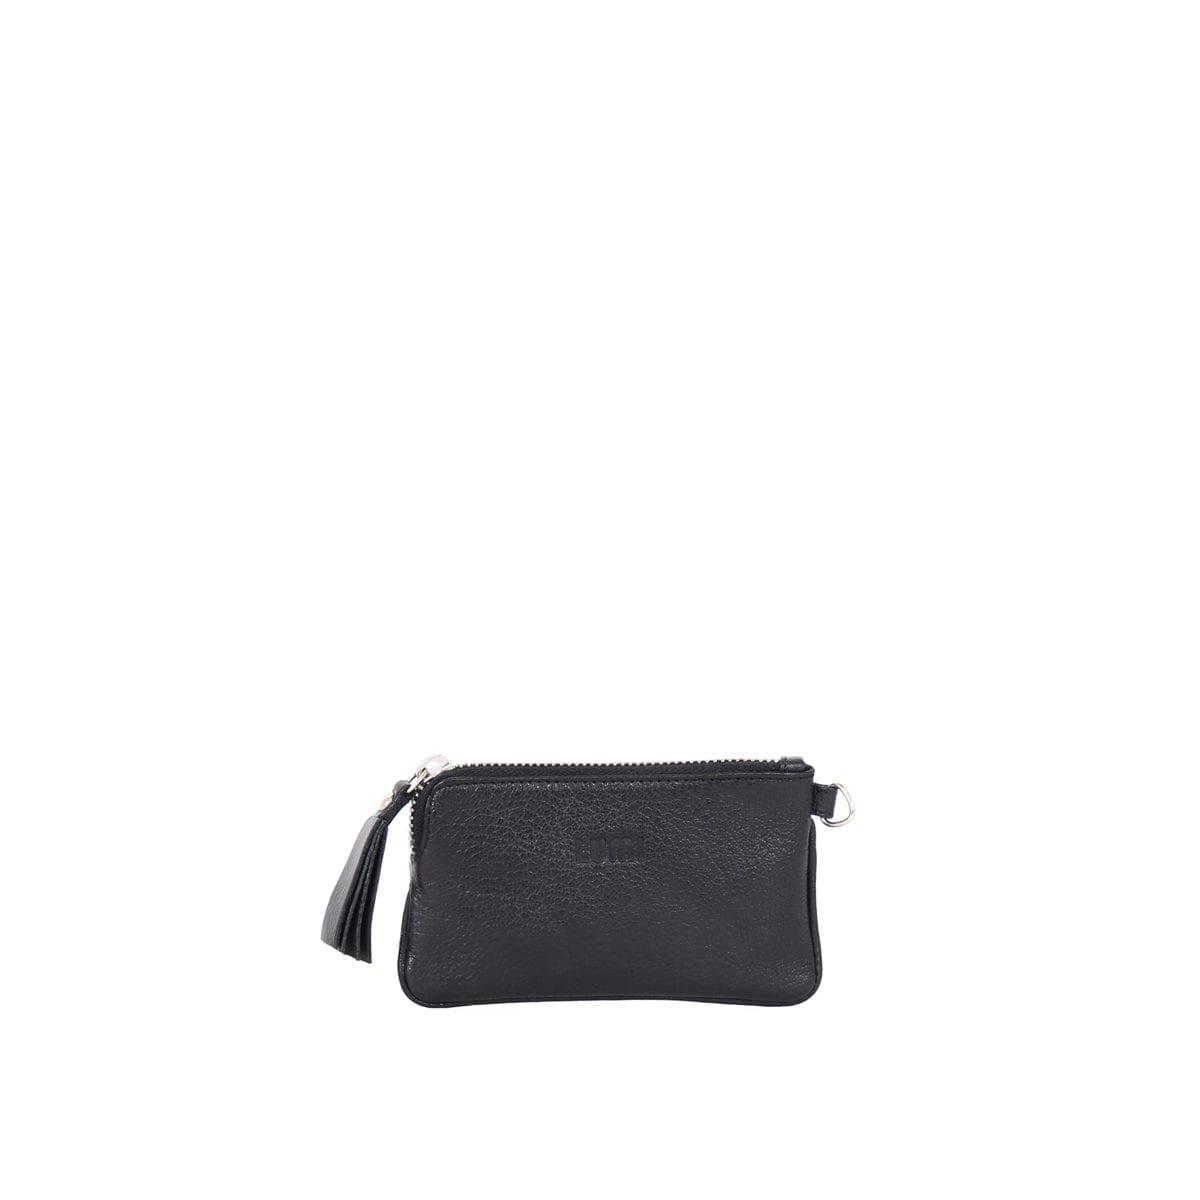 LUMI Anna Wallet in black.